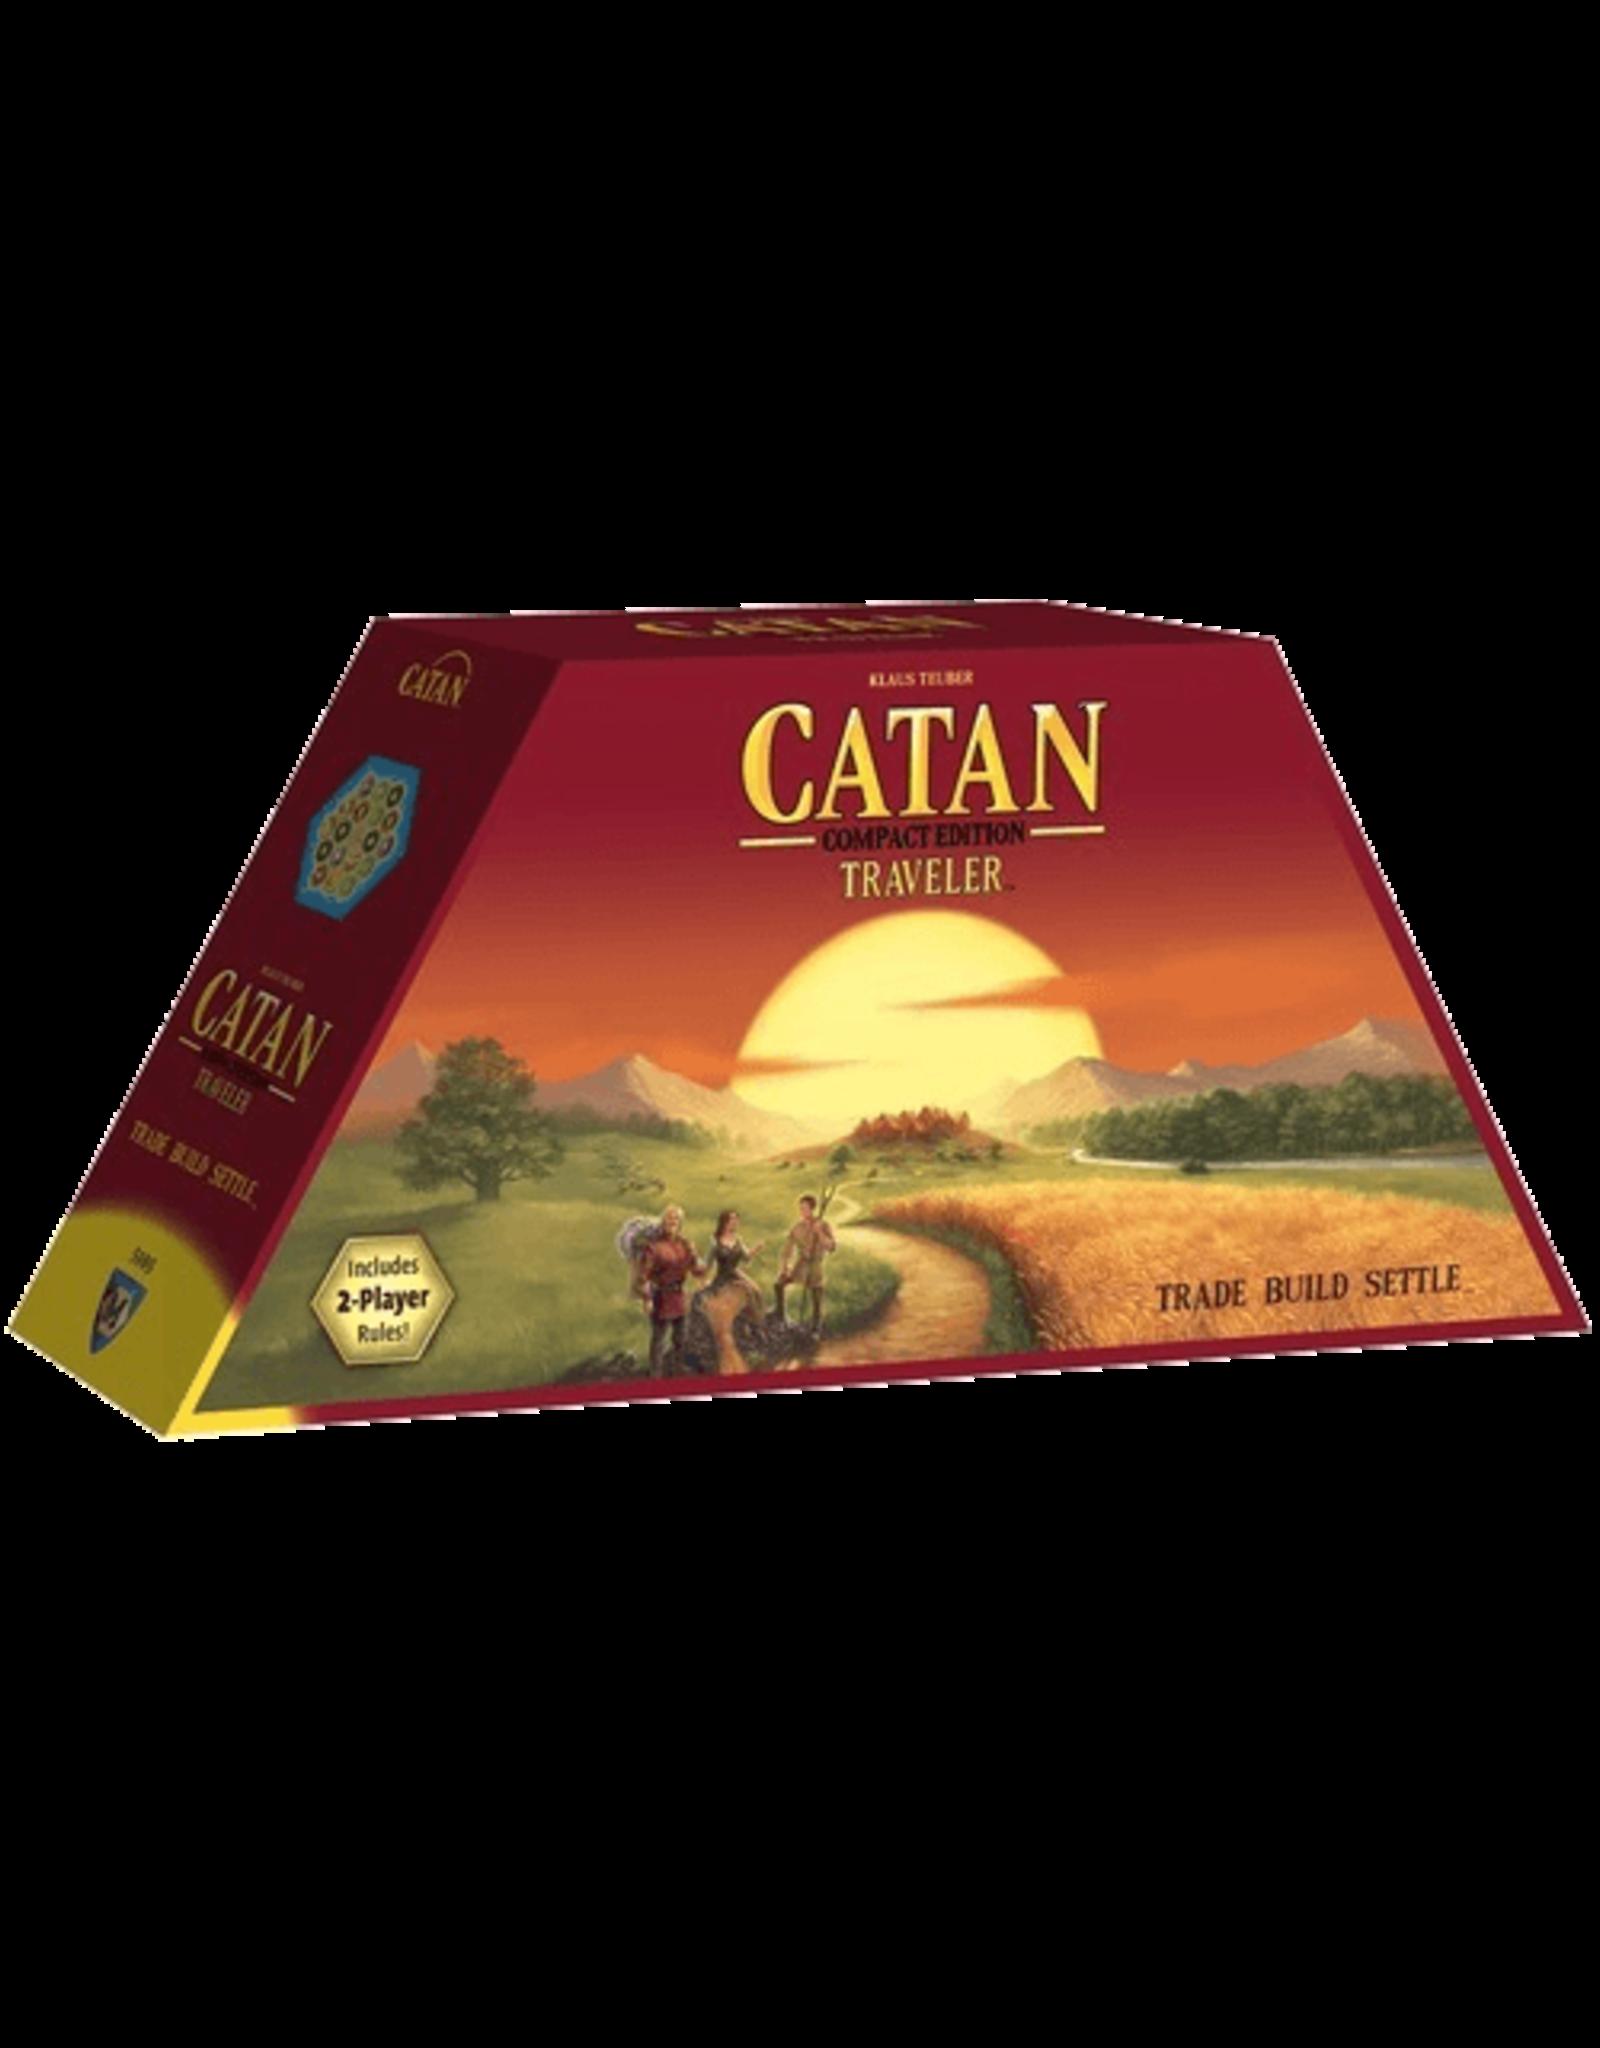 Catan Studio Catan: Traveler